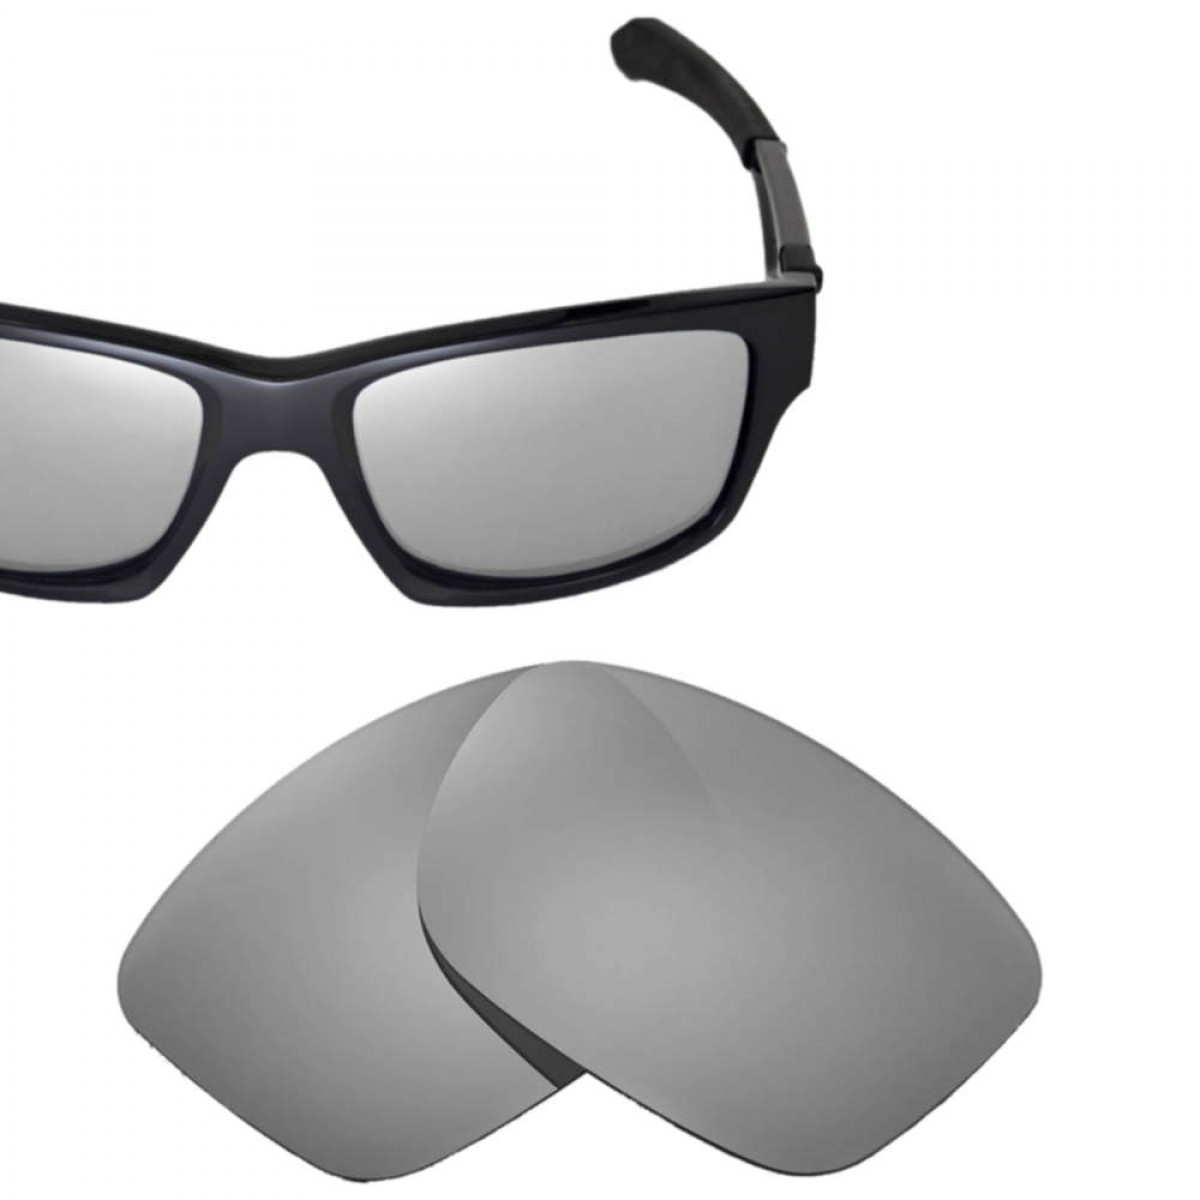 5efe3c9070 Cofery Lenses Store Cofery Replacement Lenses for Oakley Jupiter Squared  Sunglasses